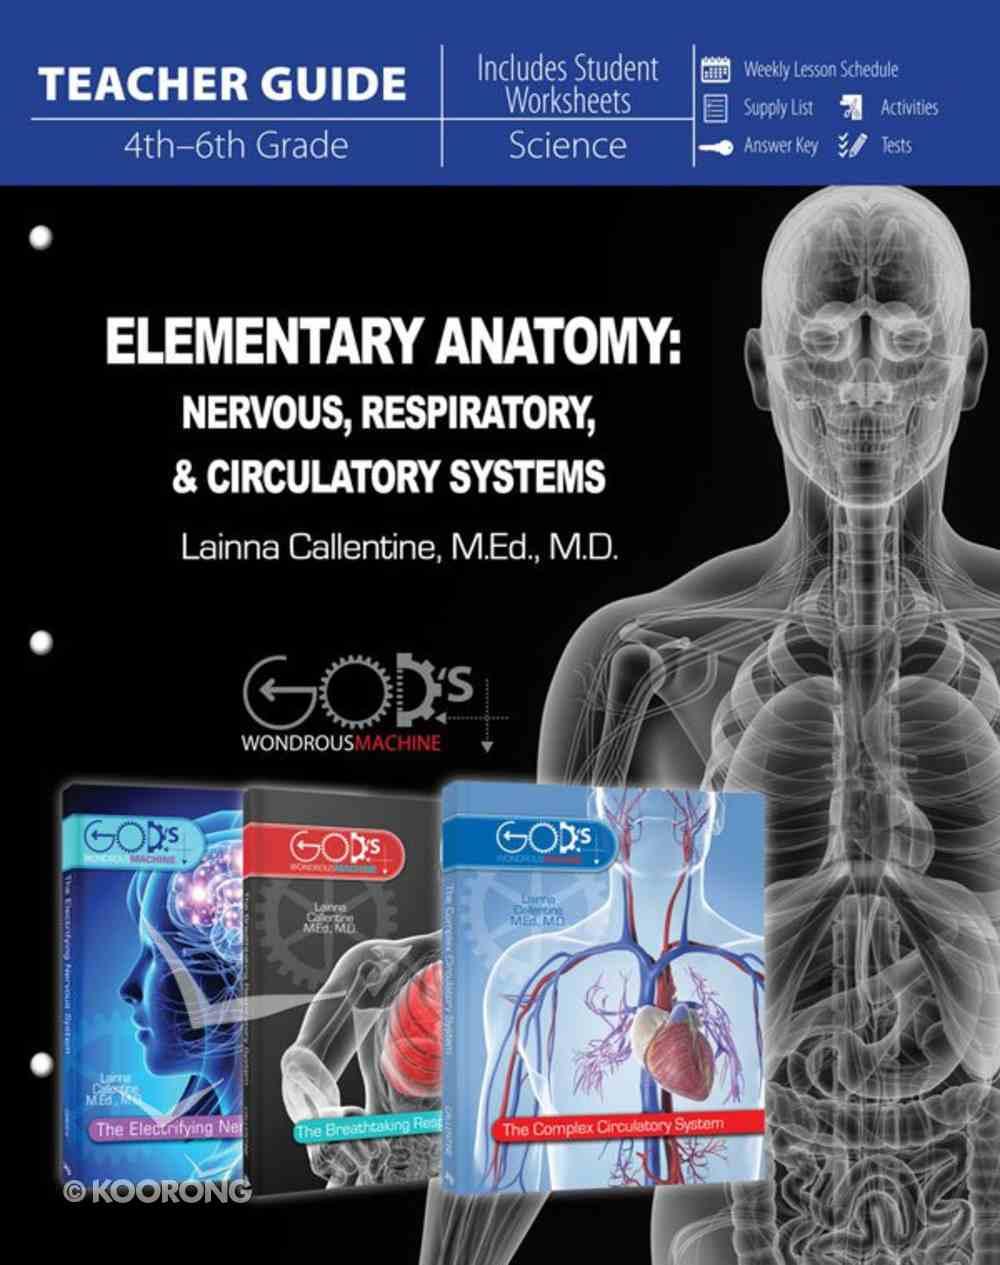 Elementary Anatomy - Nervous, Respiratory, & Circulatory Systems Teacher Guide (Teachers Guide) (God's Wondrous Machine Series) Paperback